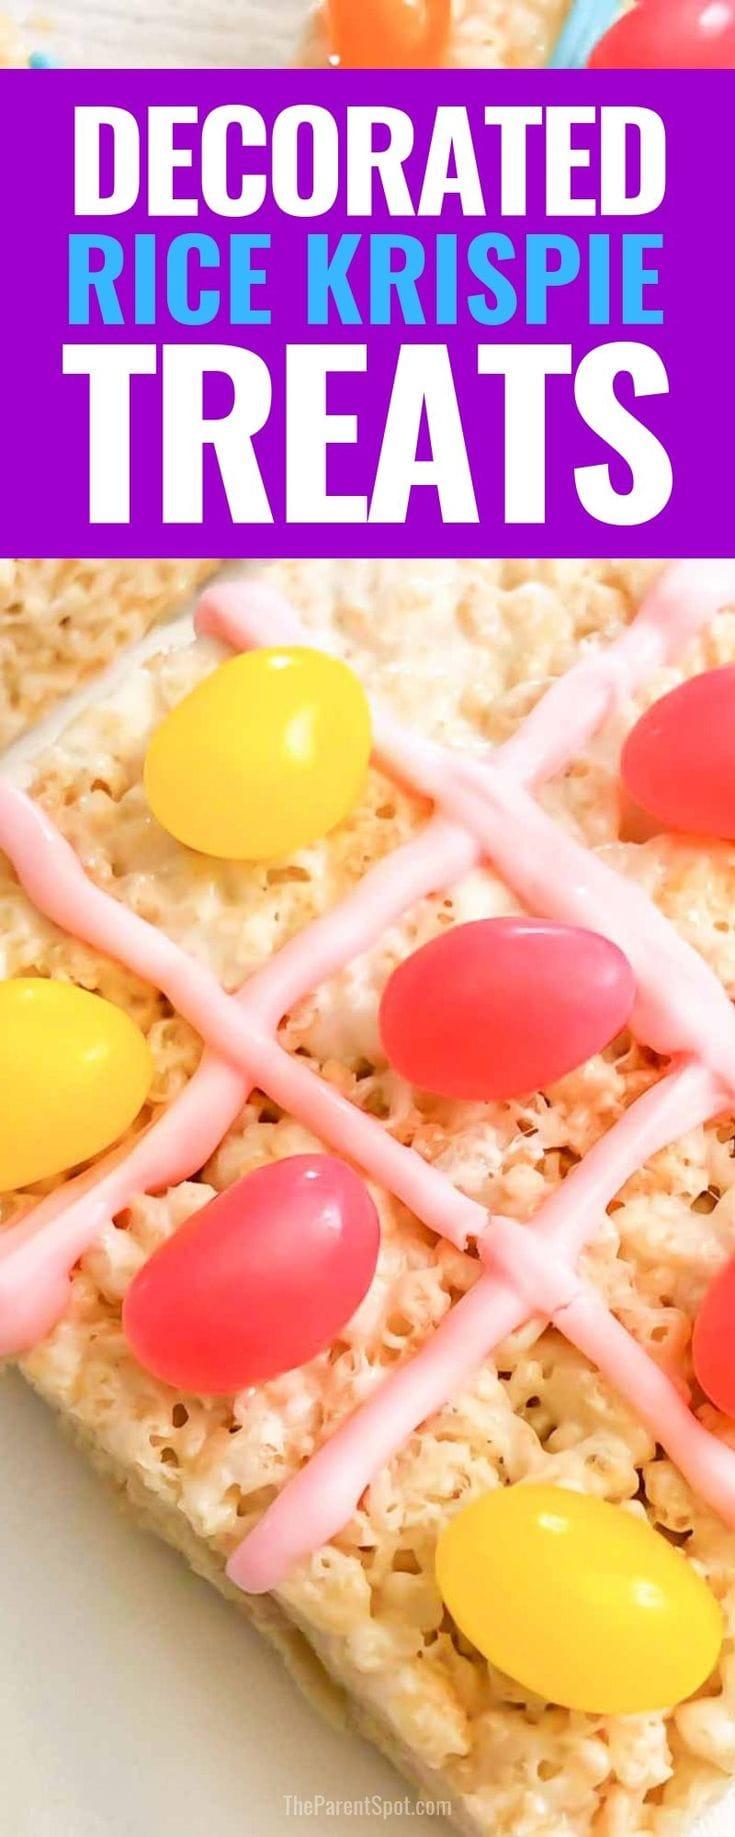 decorated Rice Krispie treats tic tac toe recipe